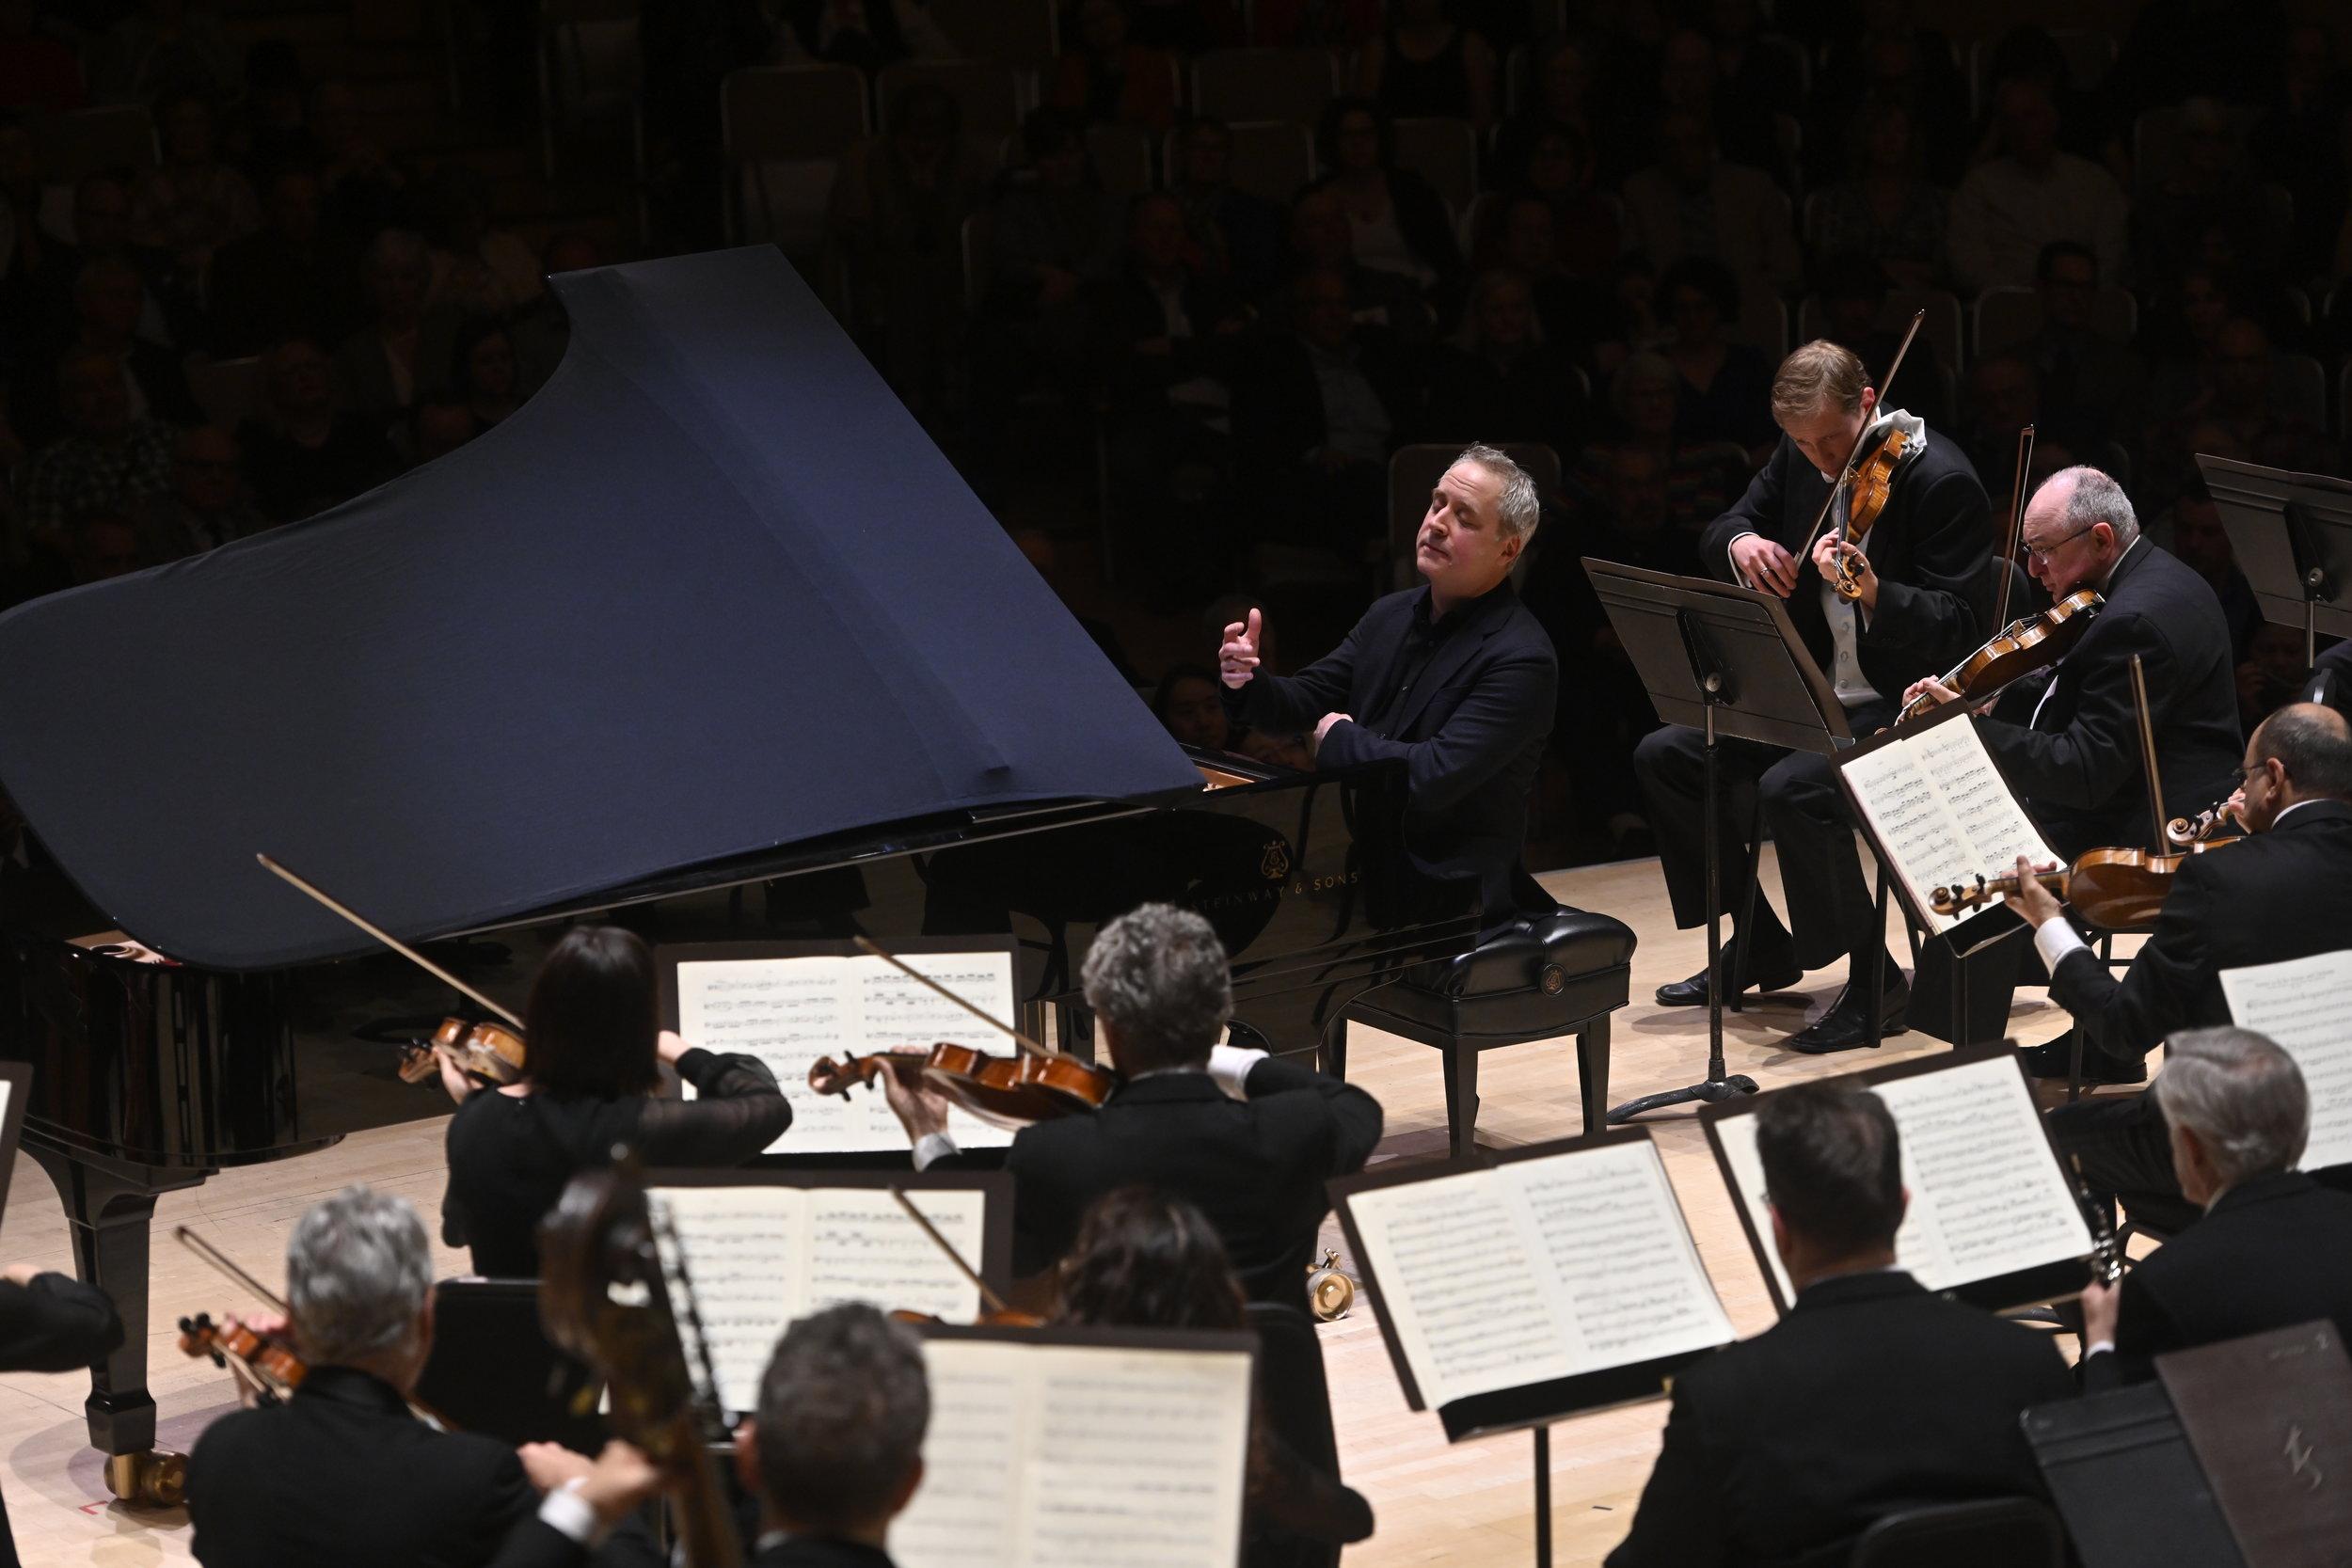 photos courtesy of the Toronto Symphony Orchestra